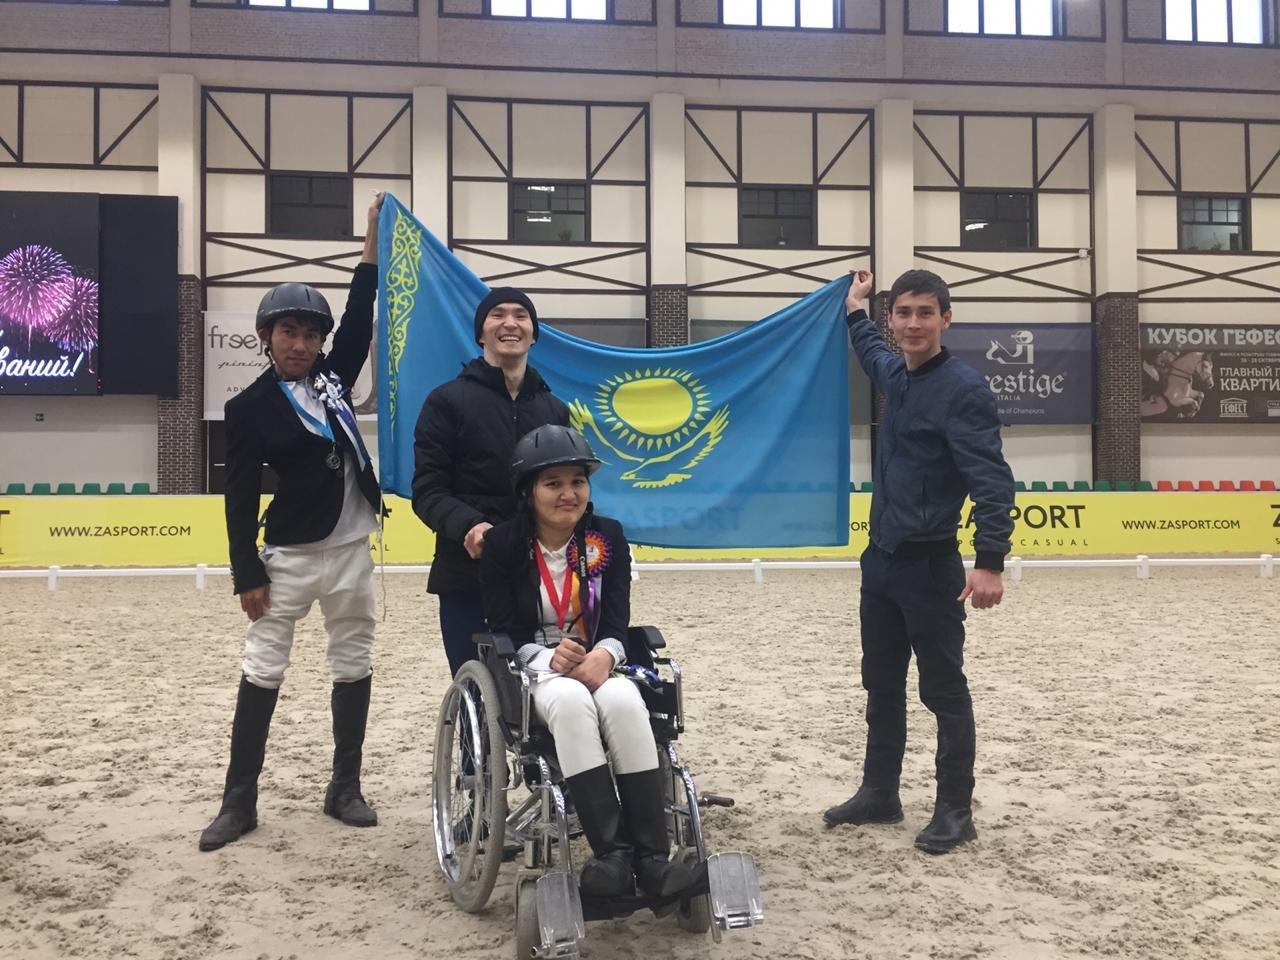 Три паралимпийца из Мангистау стали призерами турнира по конному спорту, фото-5